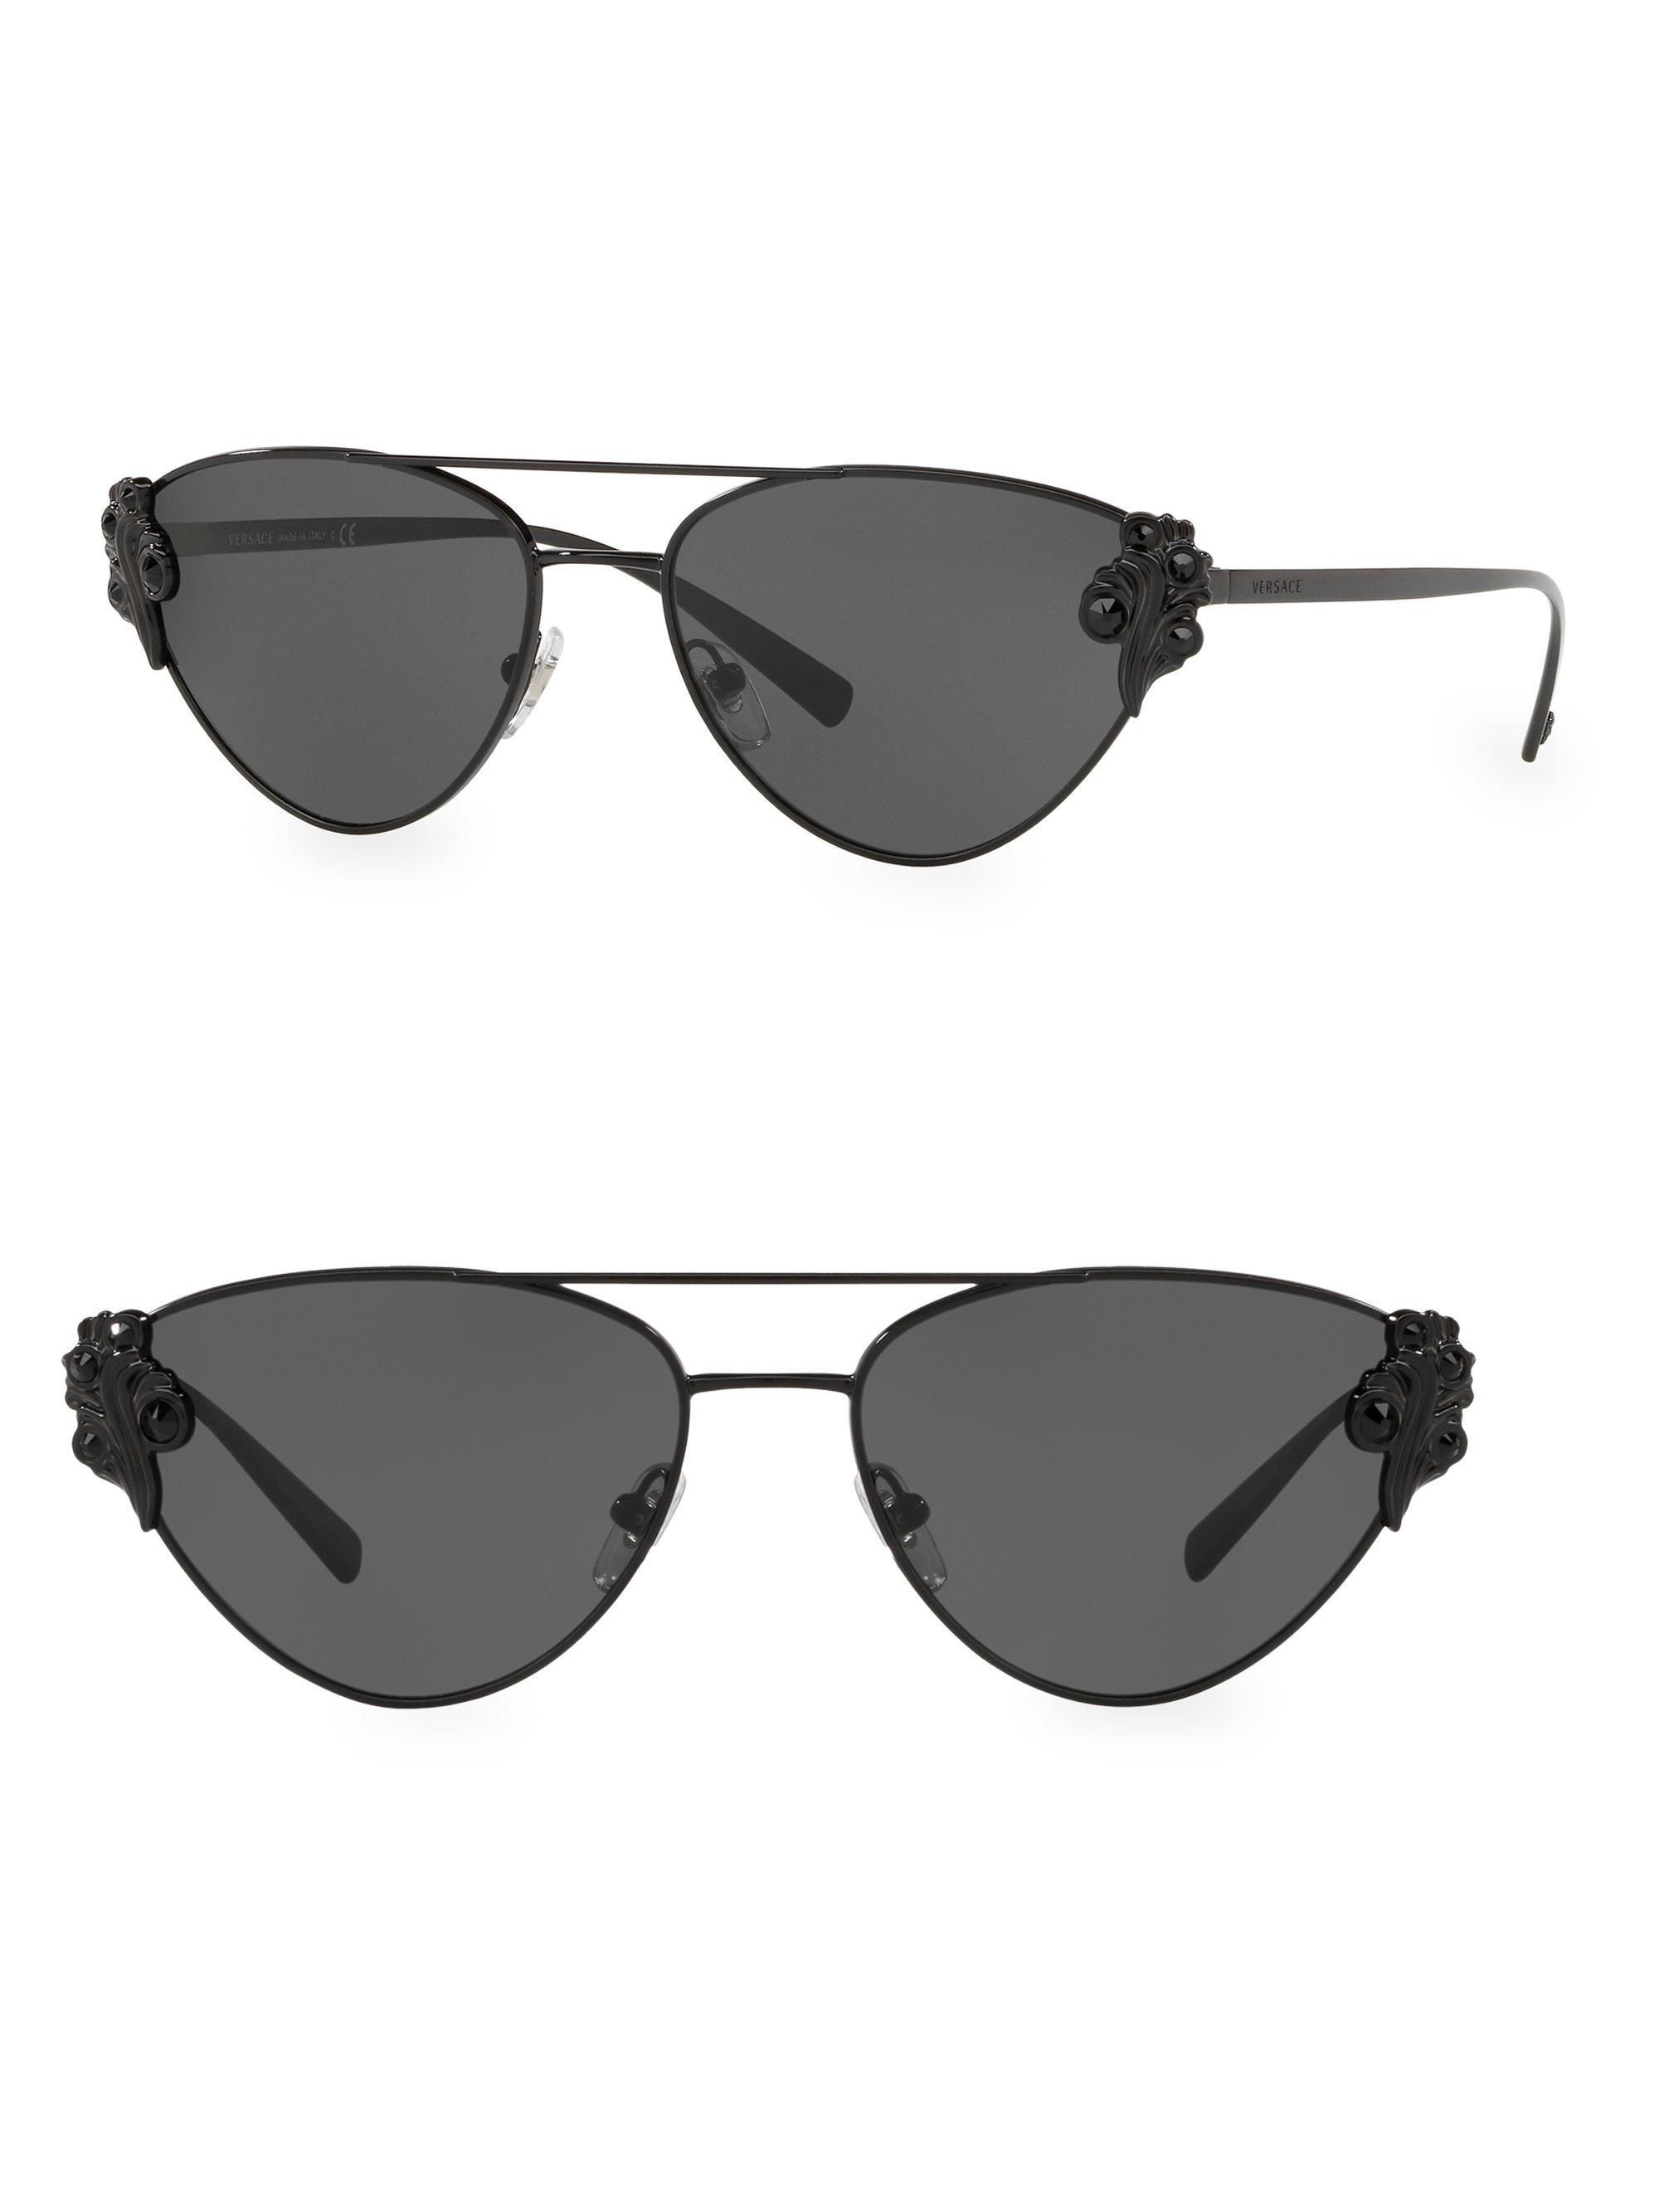 05a3508fafc1 Versace - Black 56mm Crystal Cat Eye Sunglasses - Lyst. View fullscreen